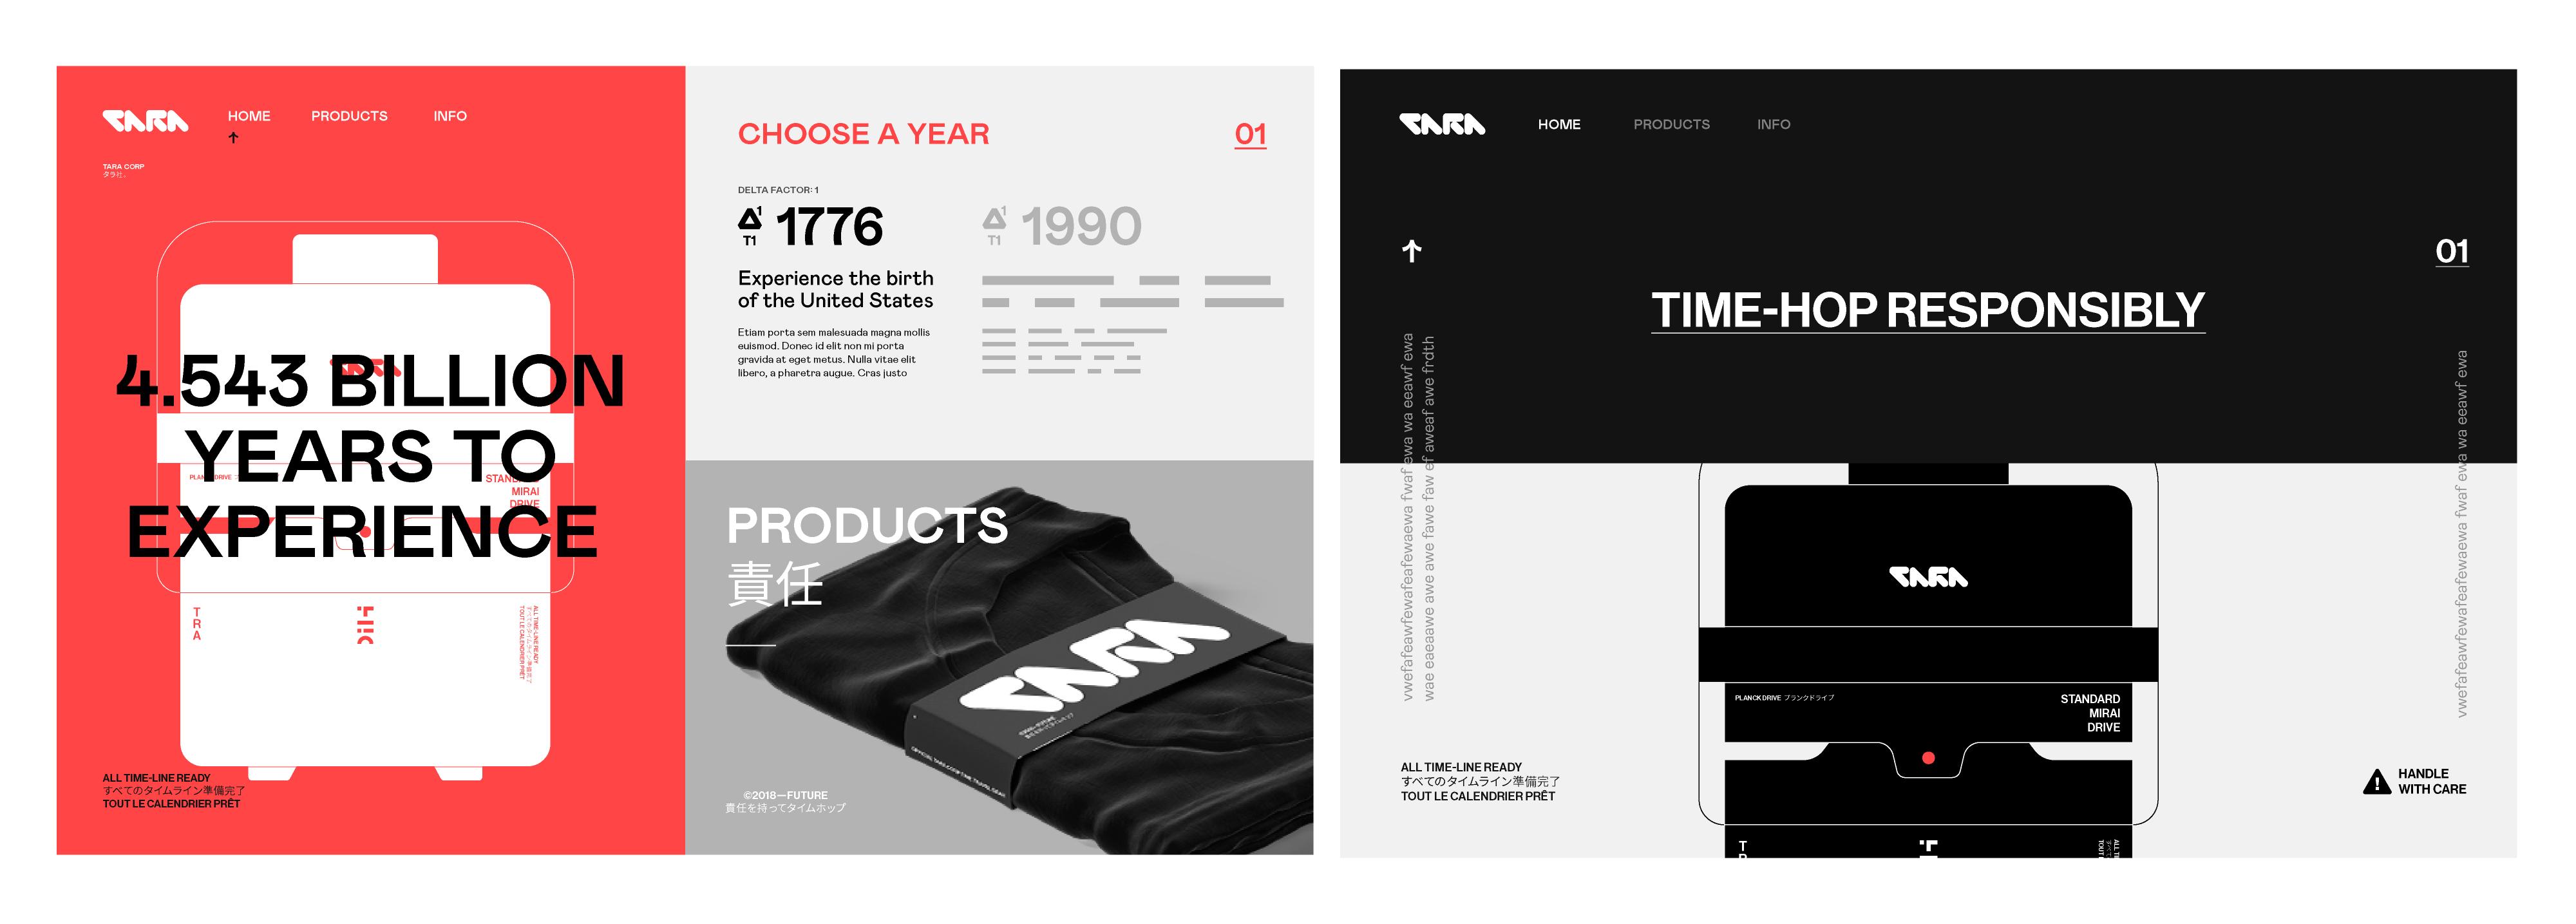 Tara_presentation_project-12a